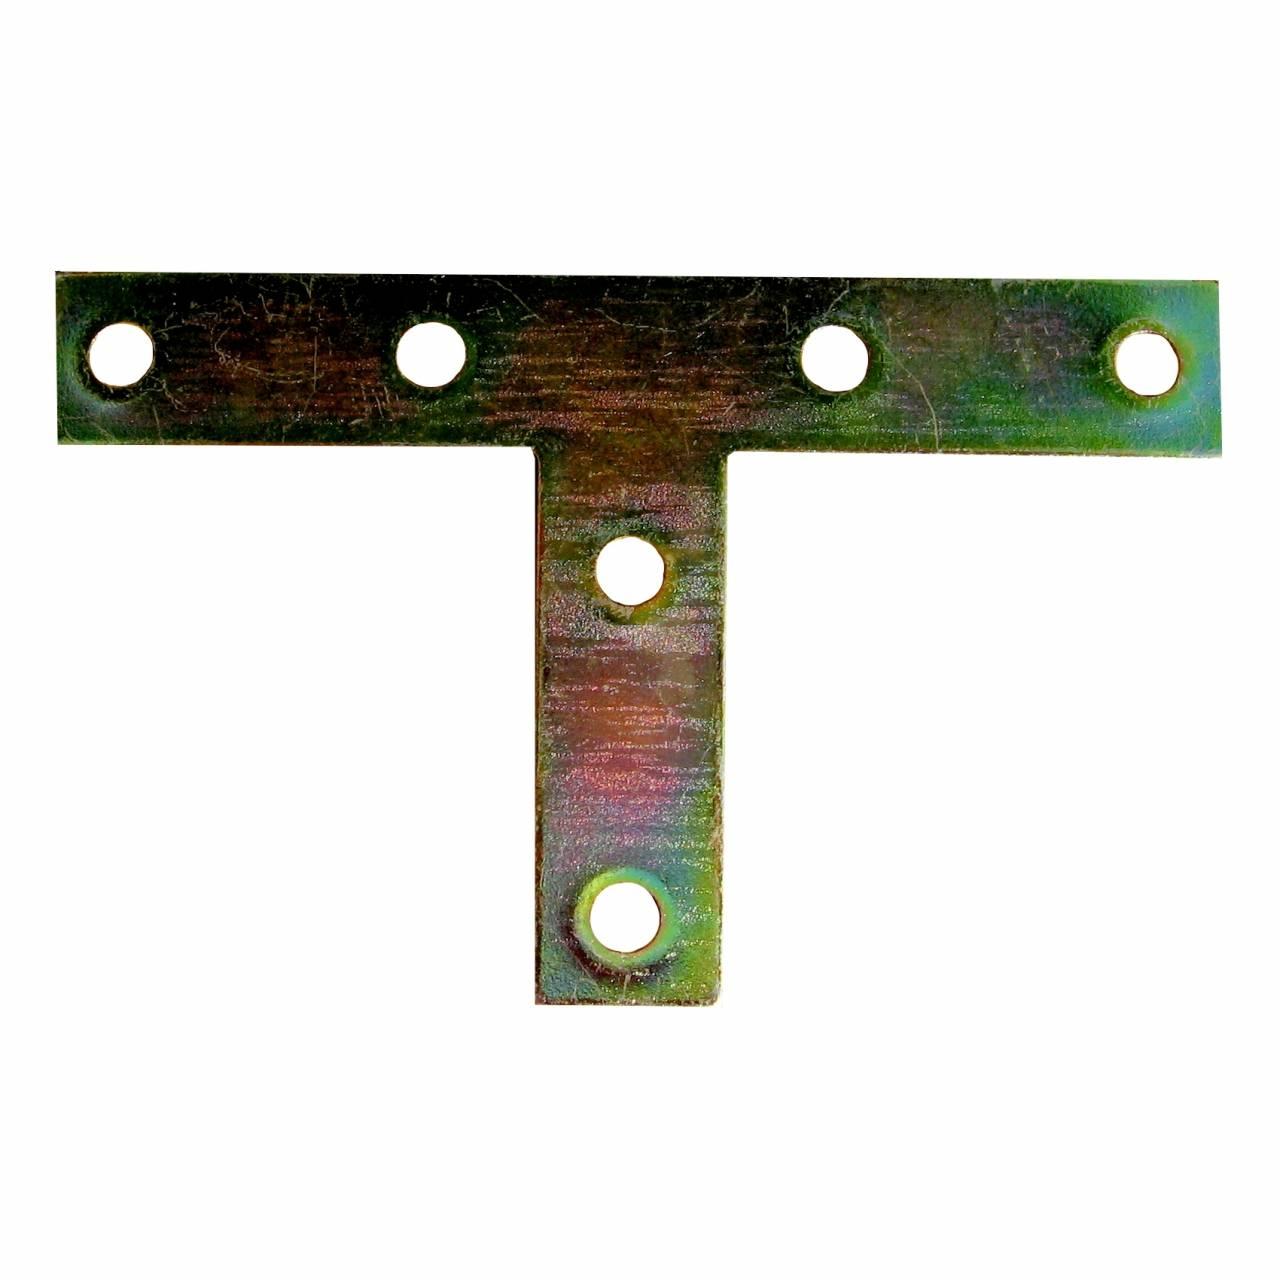 T-Flachwinkel vz 120 x 54 x 16 mm / Pck a 2 Stück